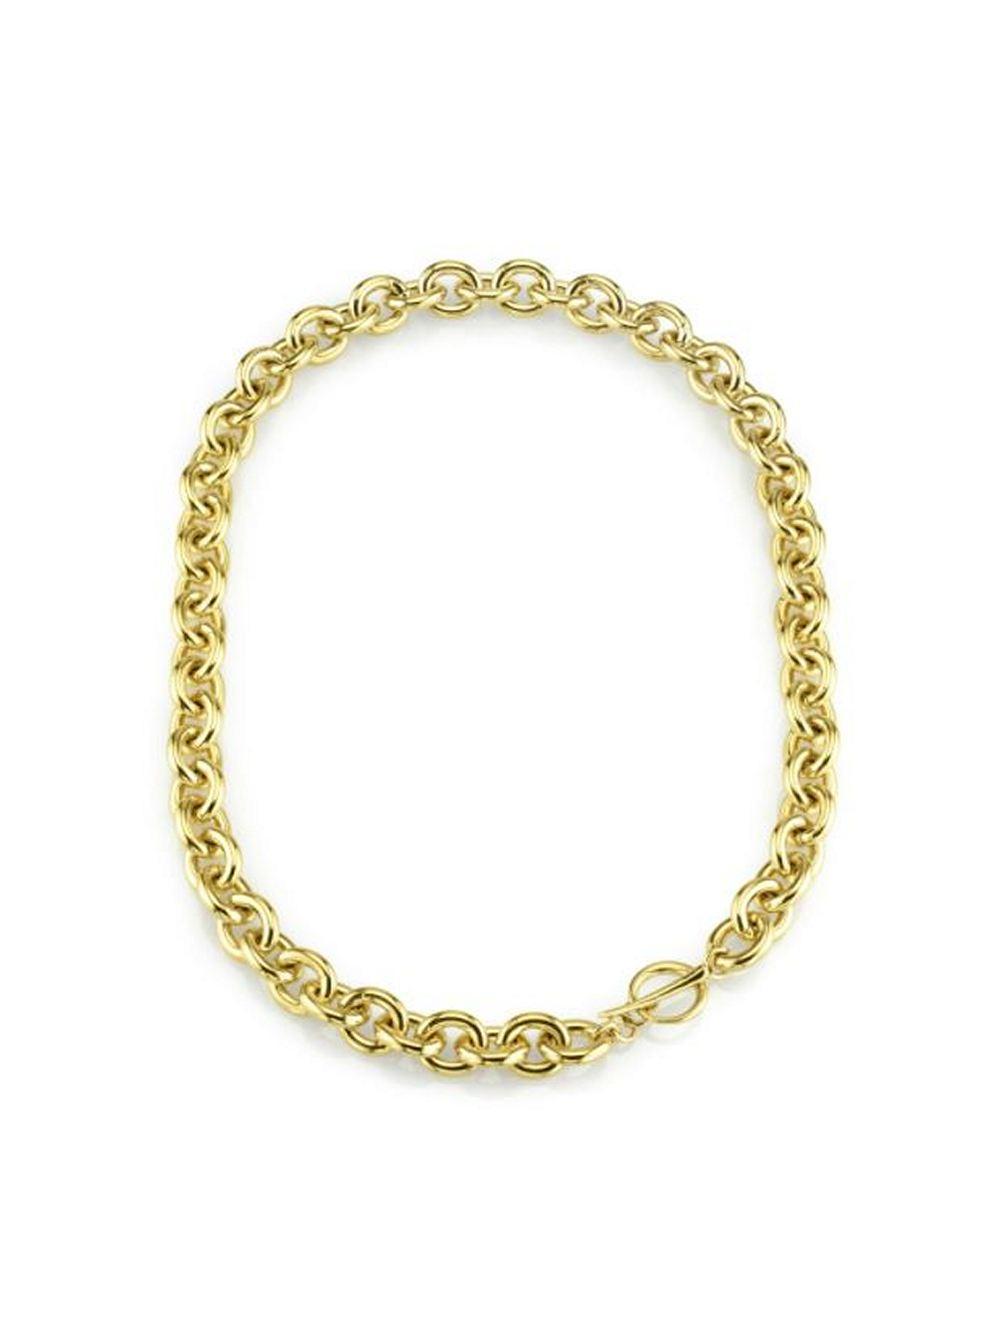 Chain Choker Item # TR35